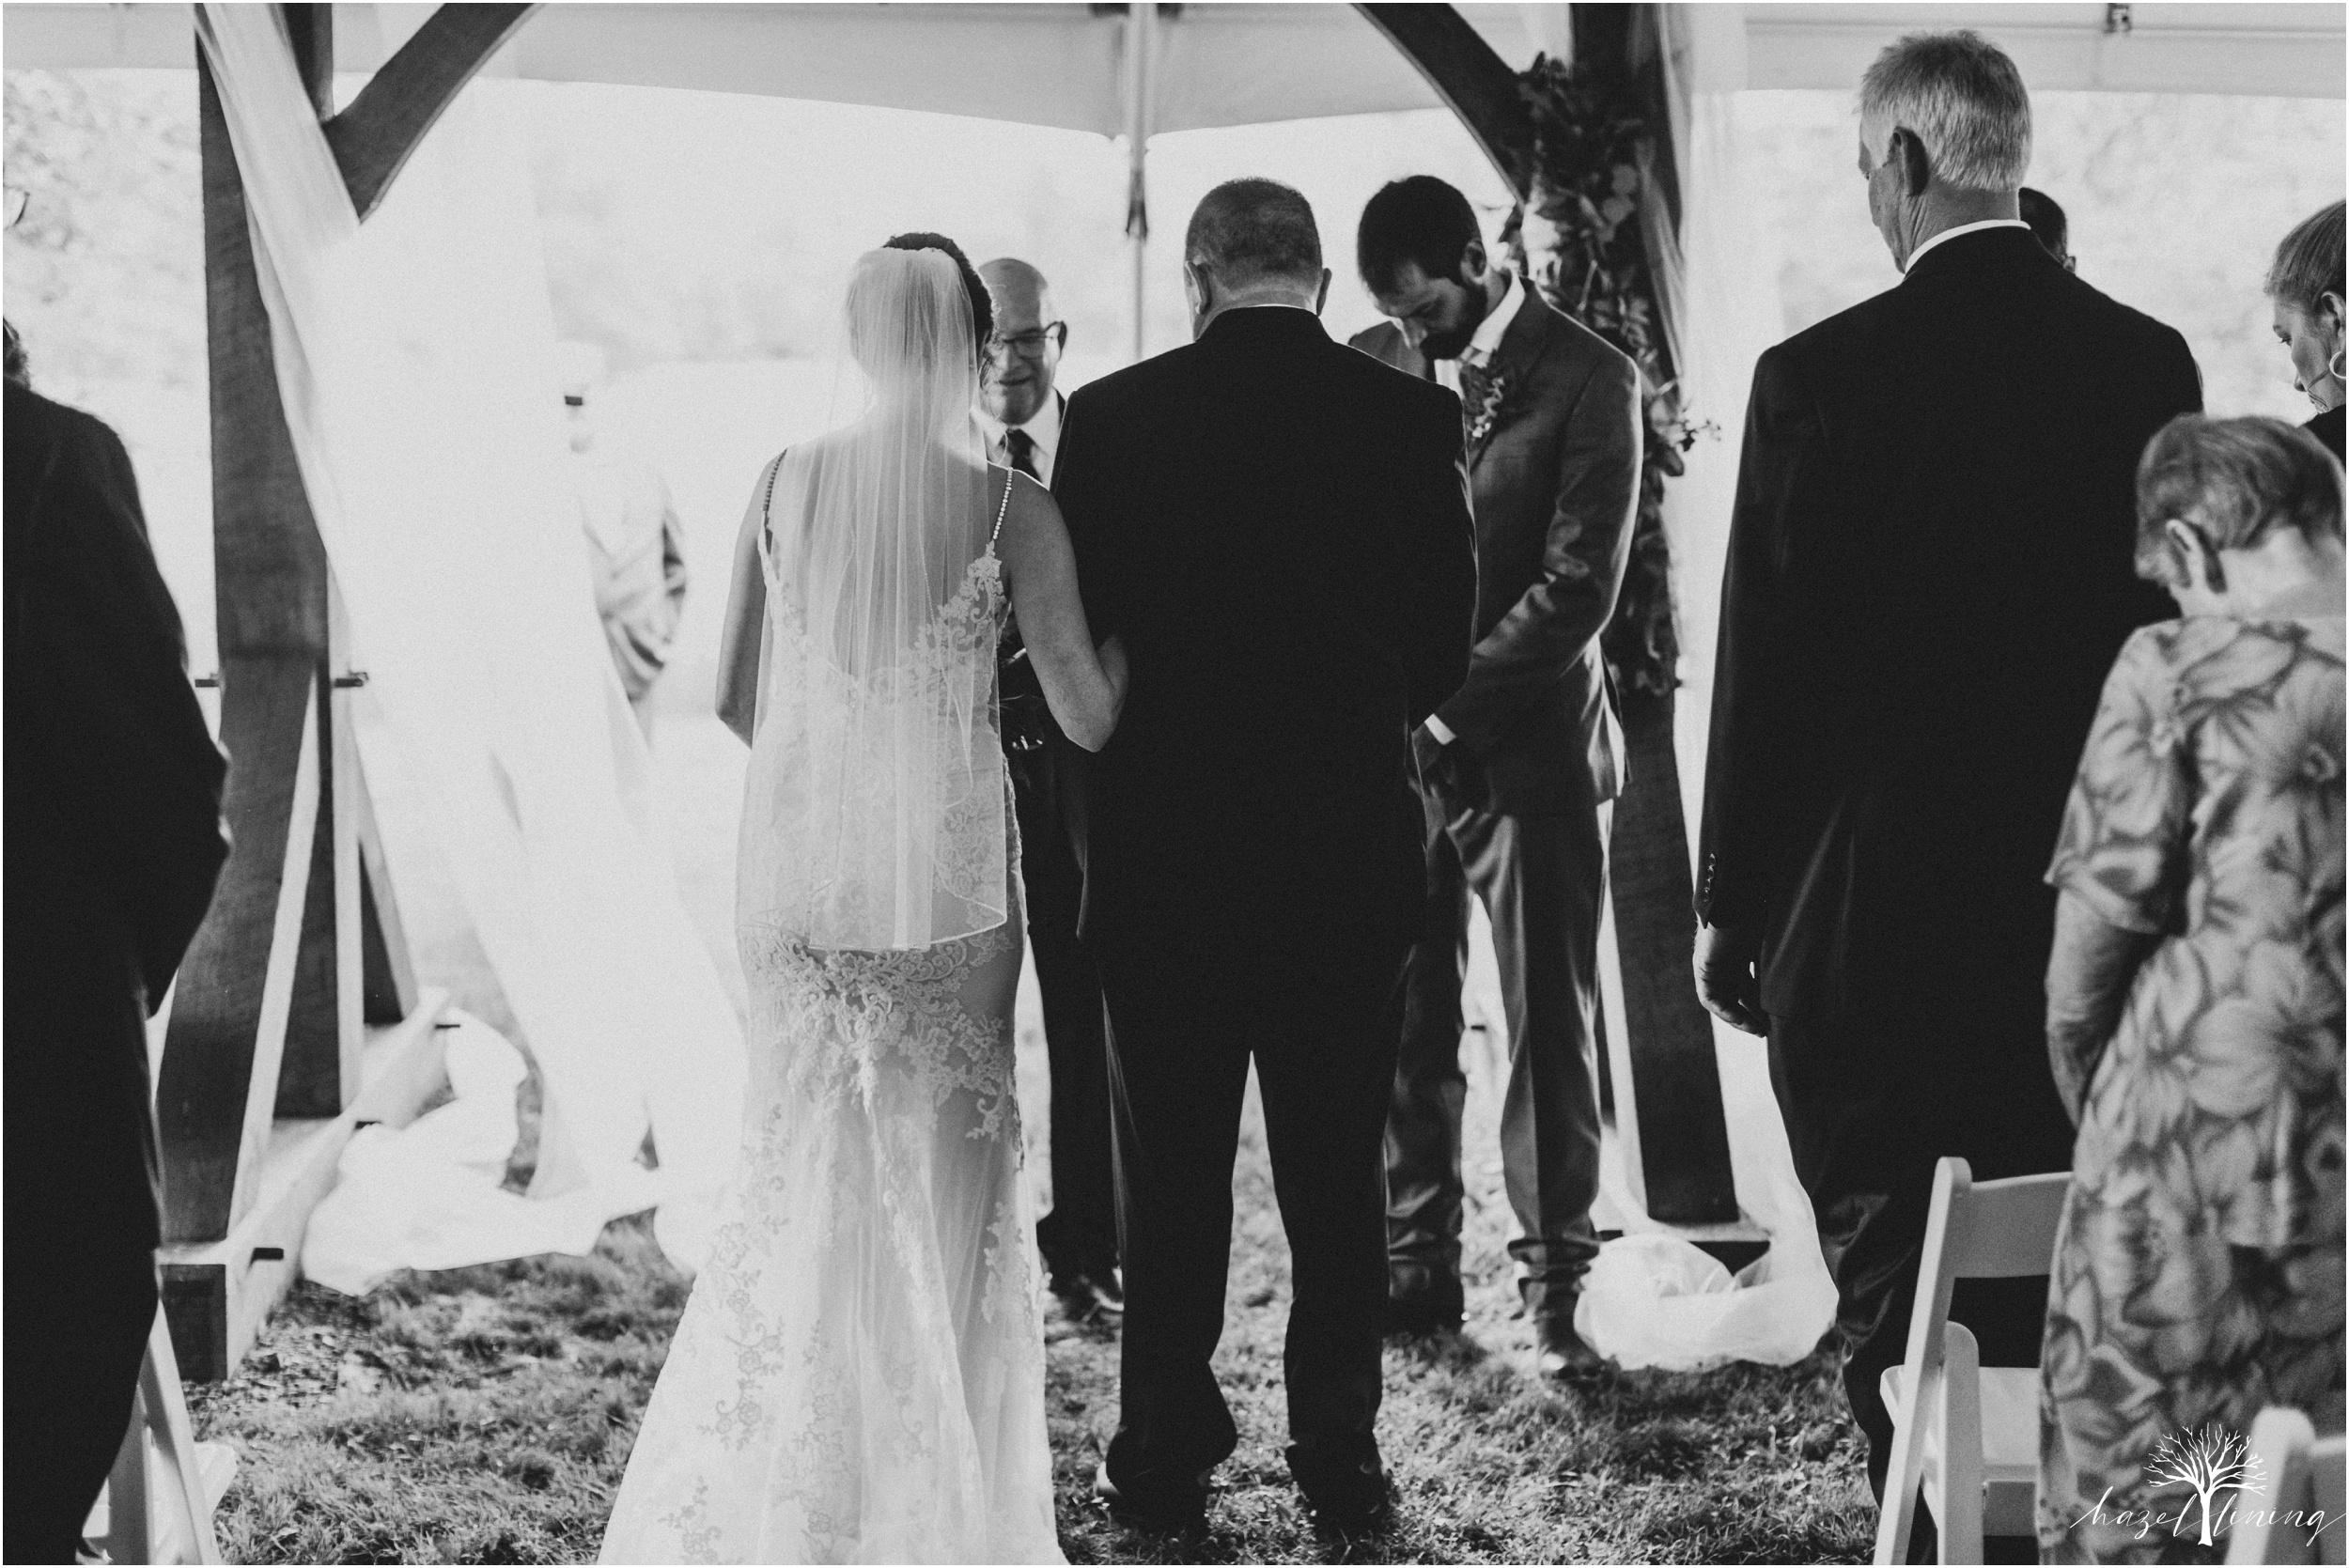 hazel-lining-travel-wedding-elopement-photography-lisa-landon-shoemaker-the-farm-bakery-and-events-bucks-county-quakertown-pennsylvania-summer-country-outdoor-farm-wedding_0054.jpg